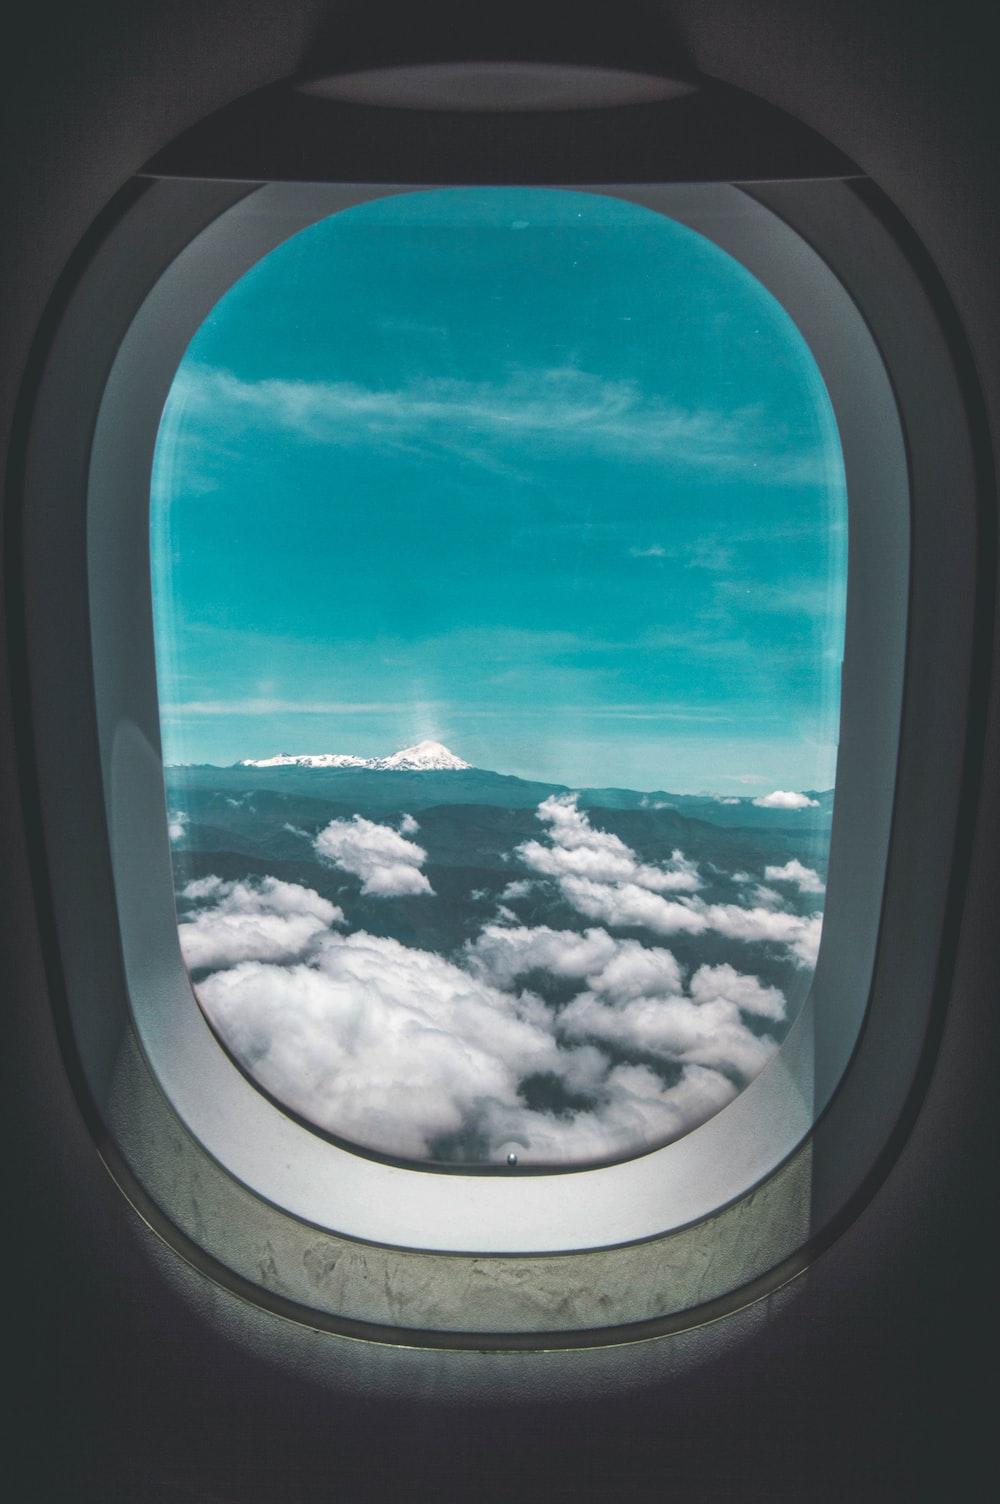 airplane window during daytime